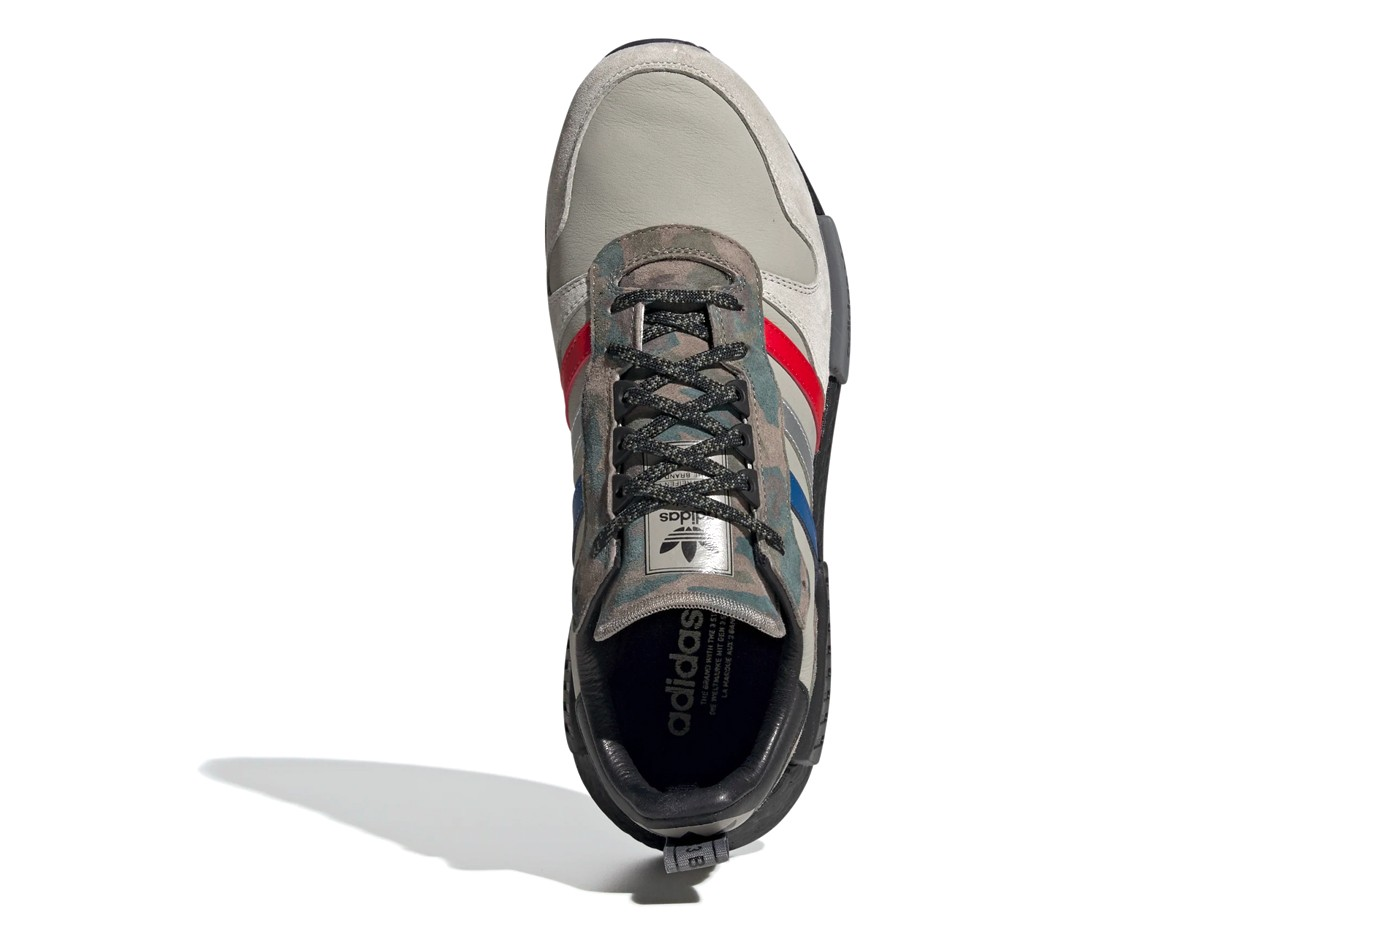 adidas Originals XR1 Hybrid Collection